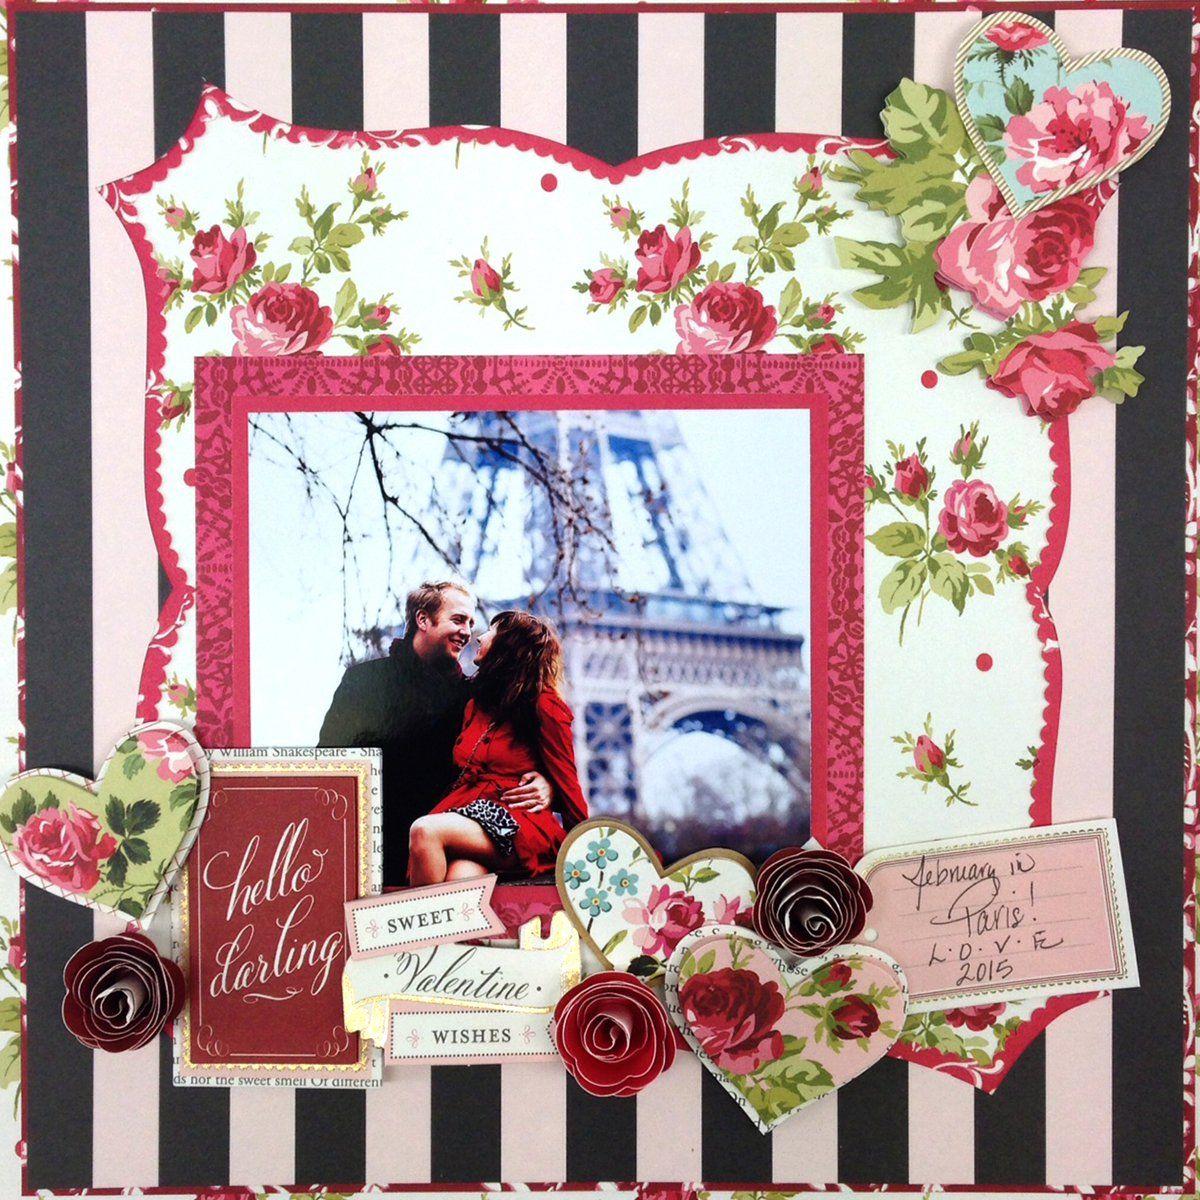 Juliet scrapbook ideas - Anna Griffin Juliet Papercrafting Kit Bursting With Lush Flowers Rich Damasks And Darling Hearts Scrapbooking Valentine Layoutsgrandchildren